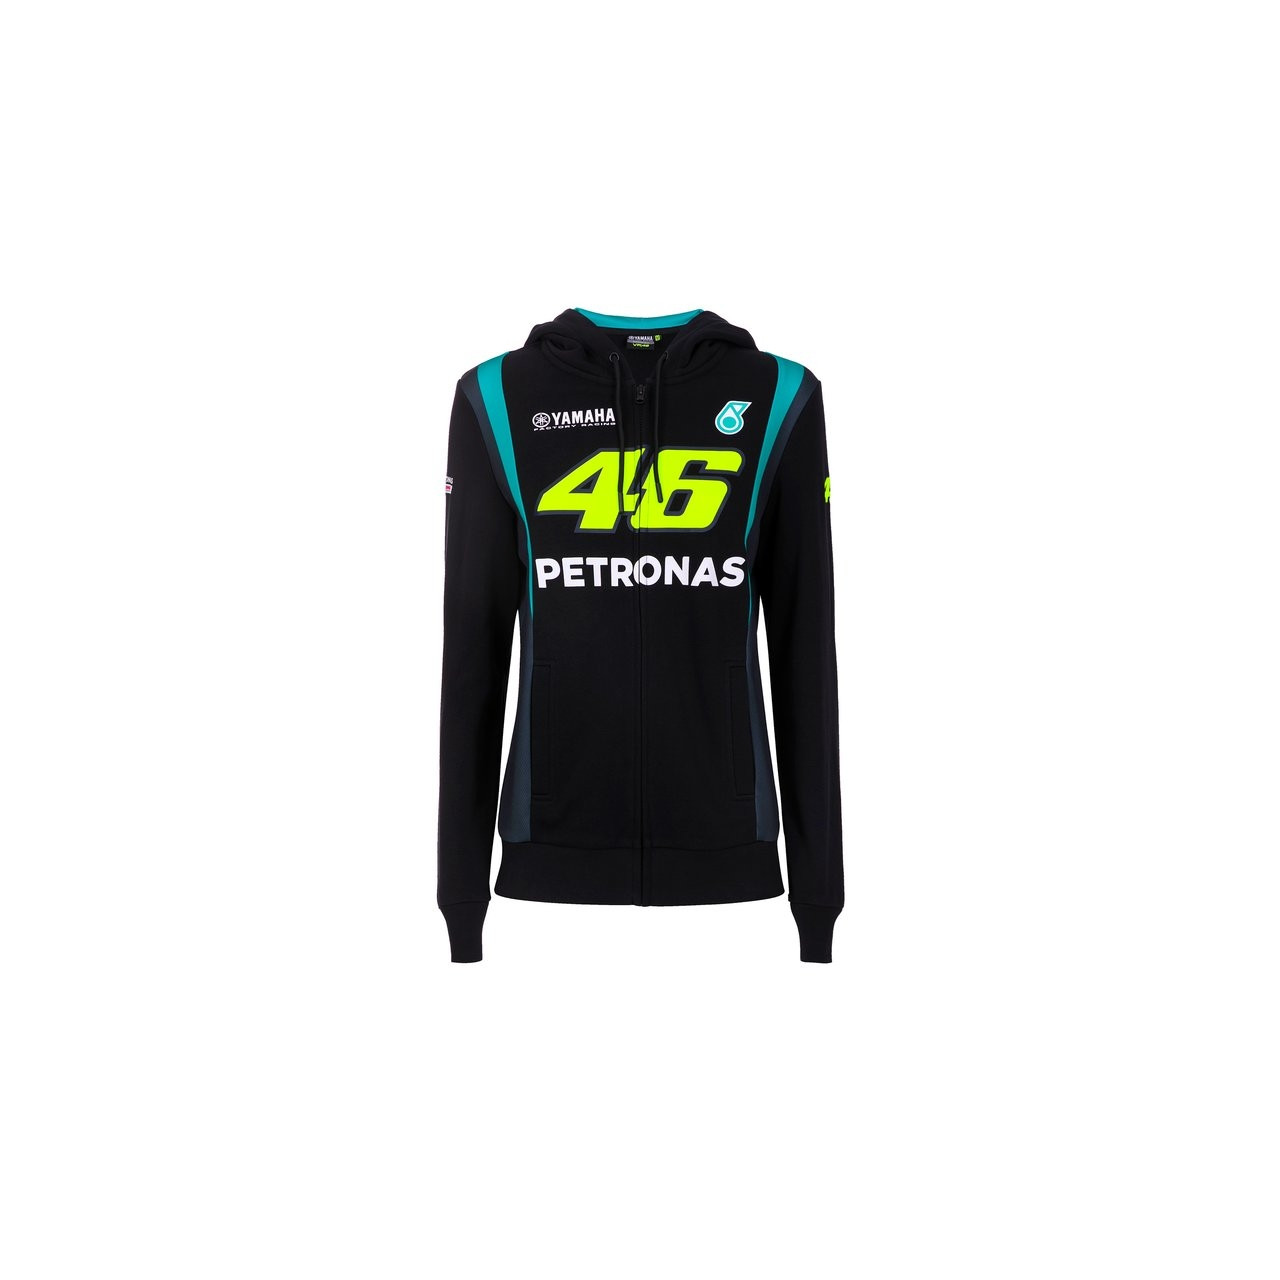 YAMAHA Sweat Zippé Femme Petronas Team VR46 2021